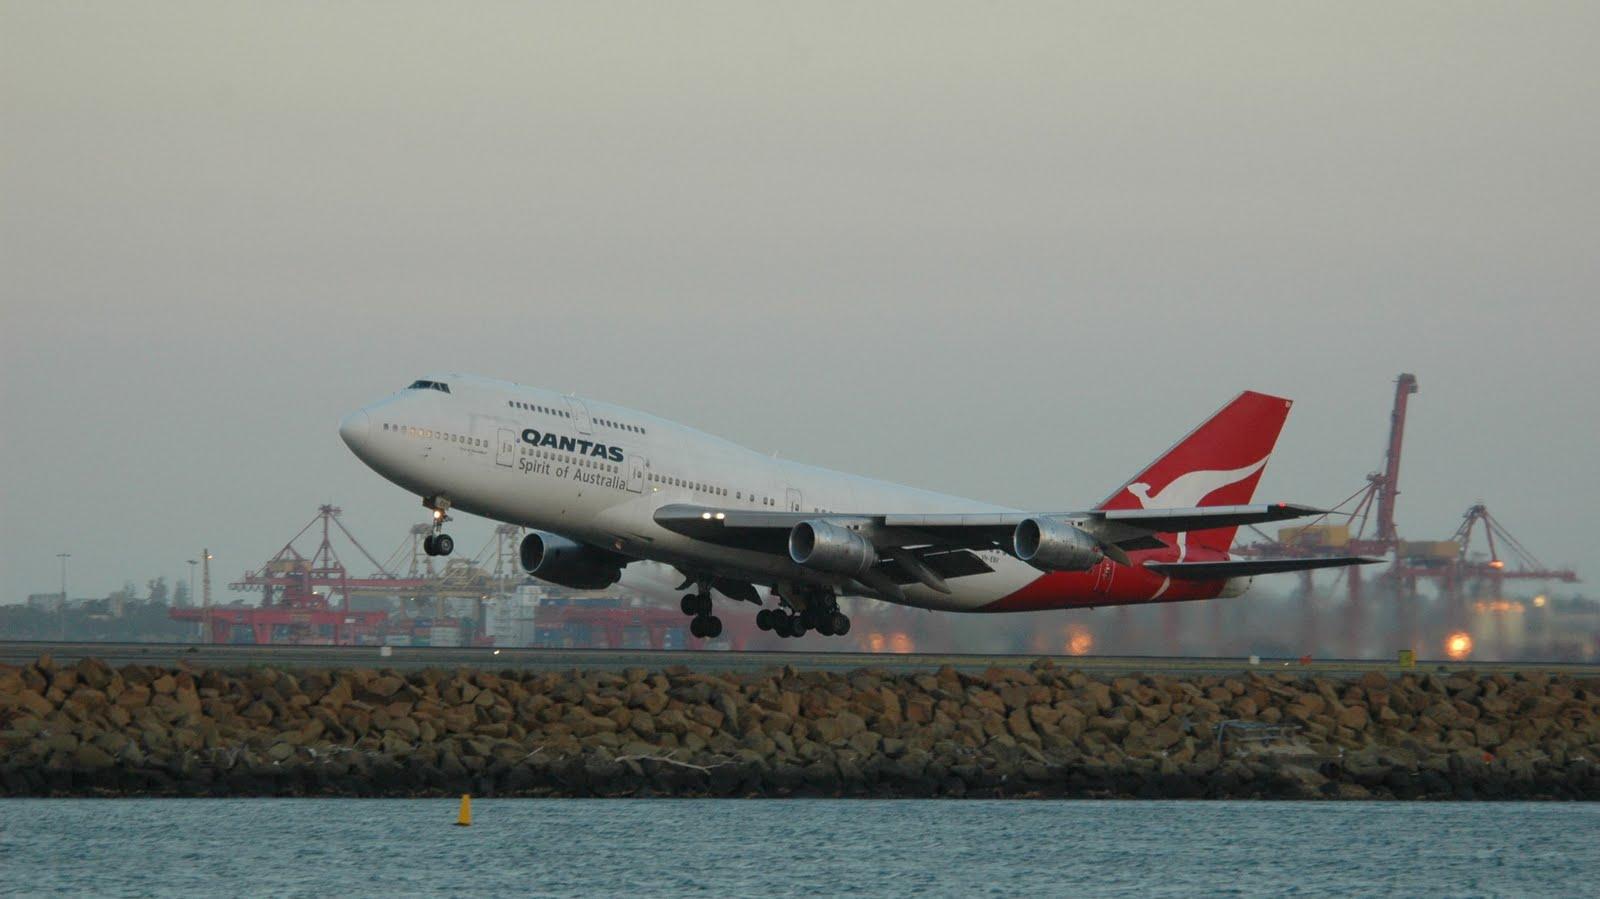 http://1.bp.blogspot.com/_ja676MG45Zg/TIgXYAuyFkI/AAAAAAAAEjs/bRbatDiKeYQ/s1600/qantas-spirit-of-australia-boeing-747-400-takeoff.jpg